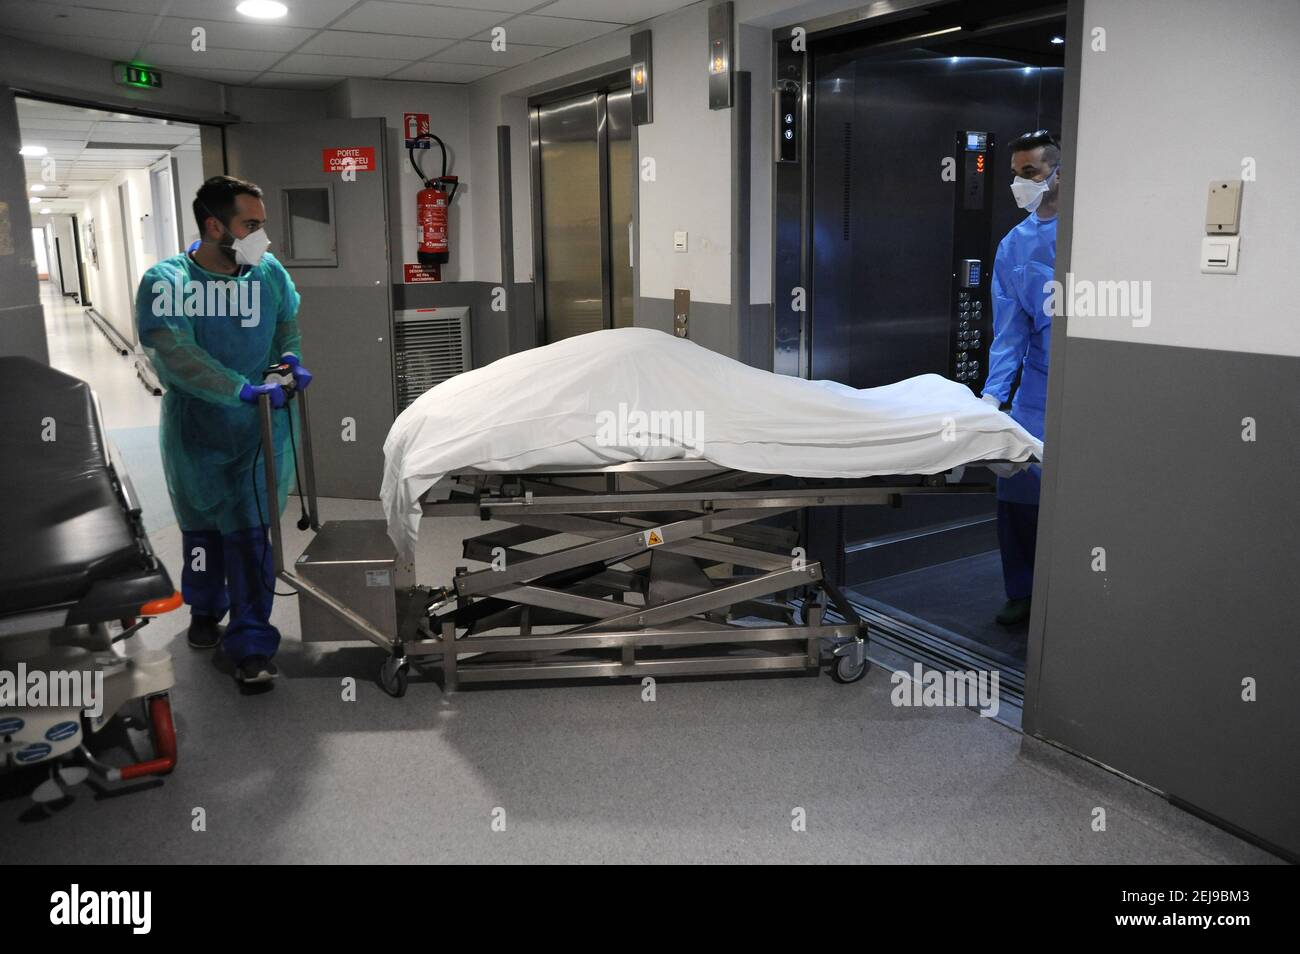 Covid-19 morti in ospedale Foto Stock